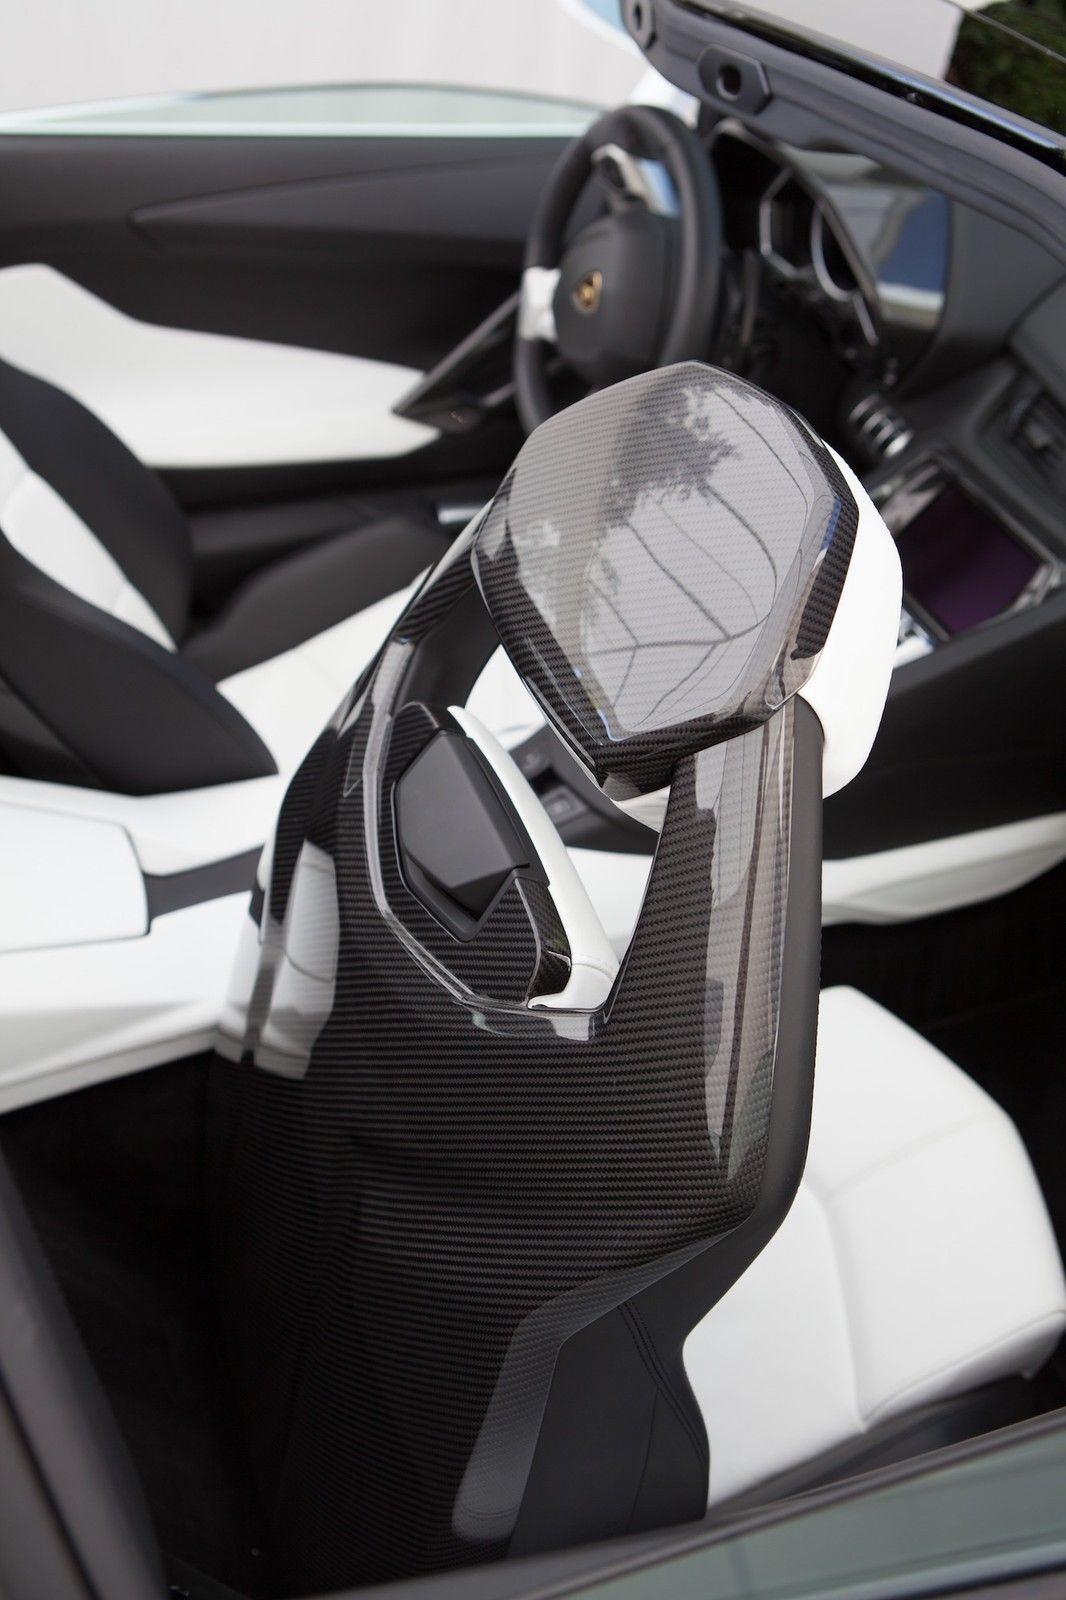 Lamborghini Aventador Roadster Dan Bilzerian